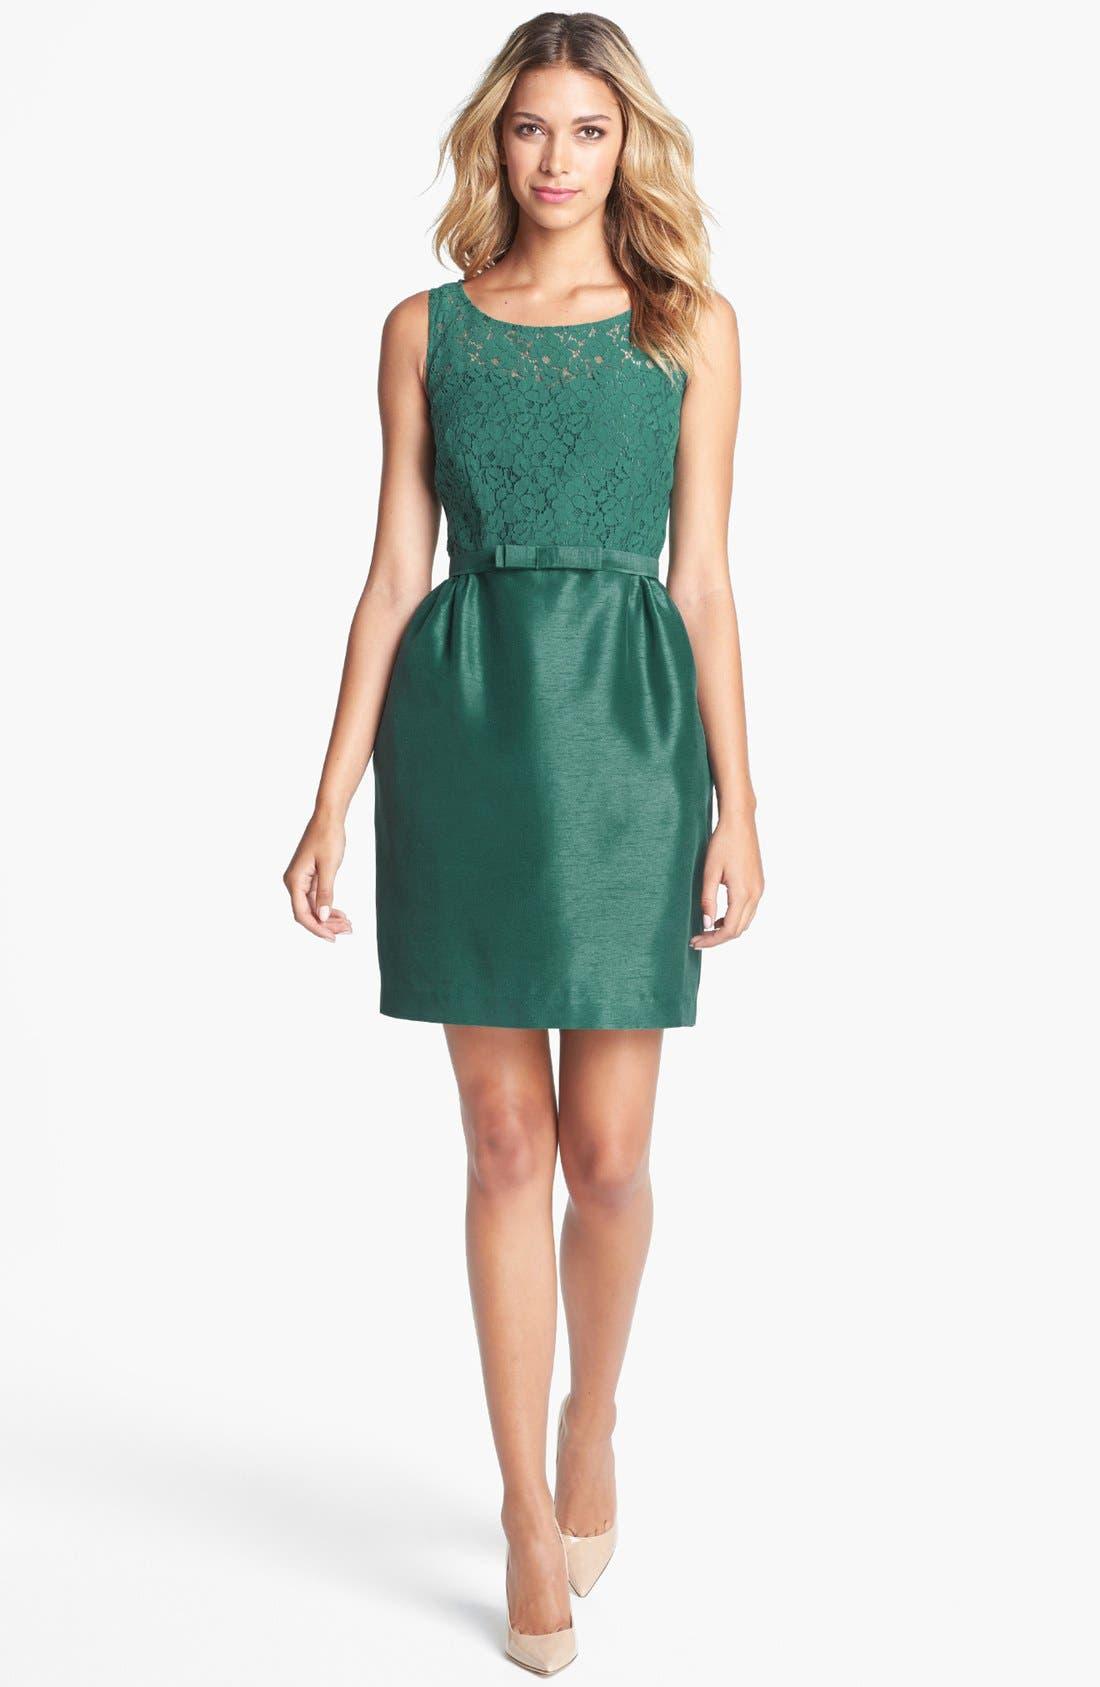 Alternate Image 1 Selected - Taylor Dresses Lace & Satin Sheath Dress